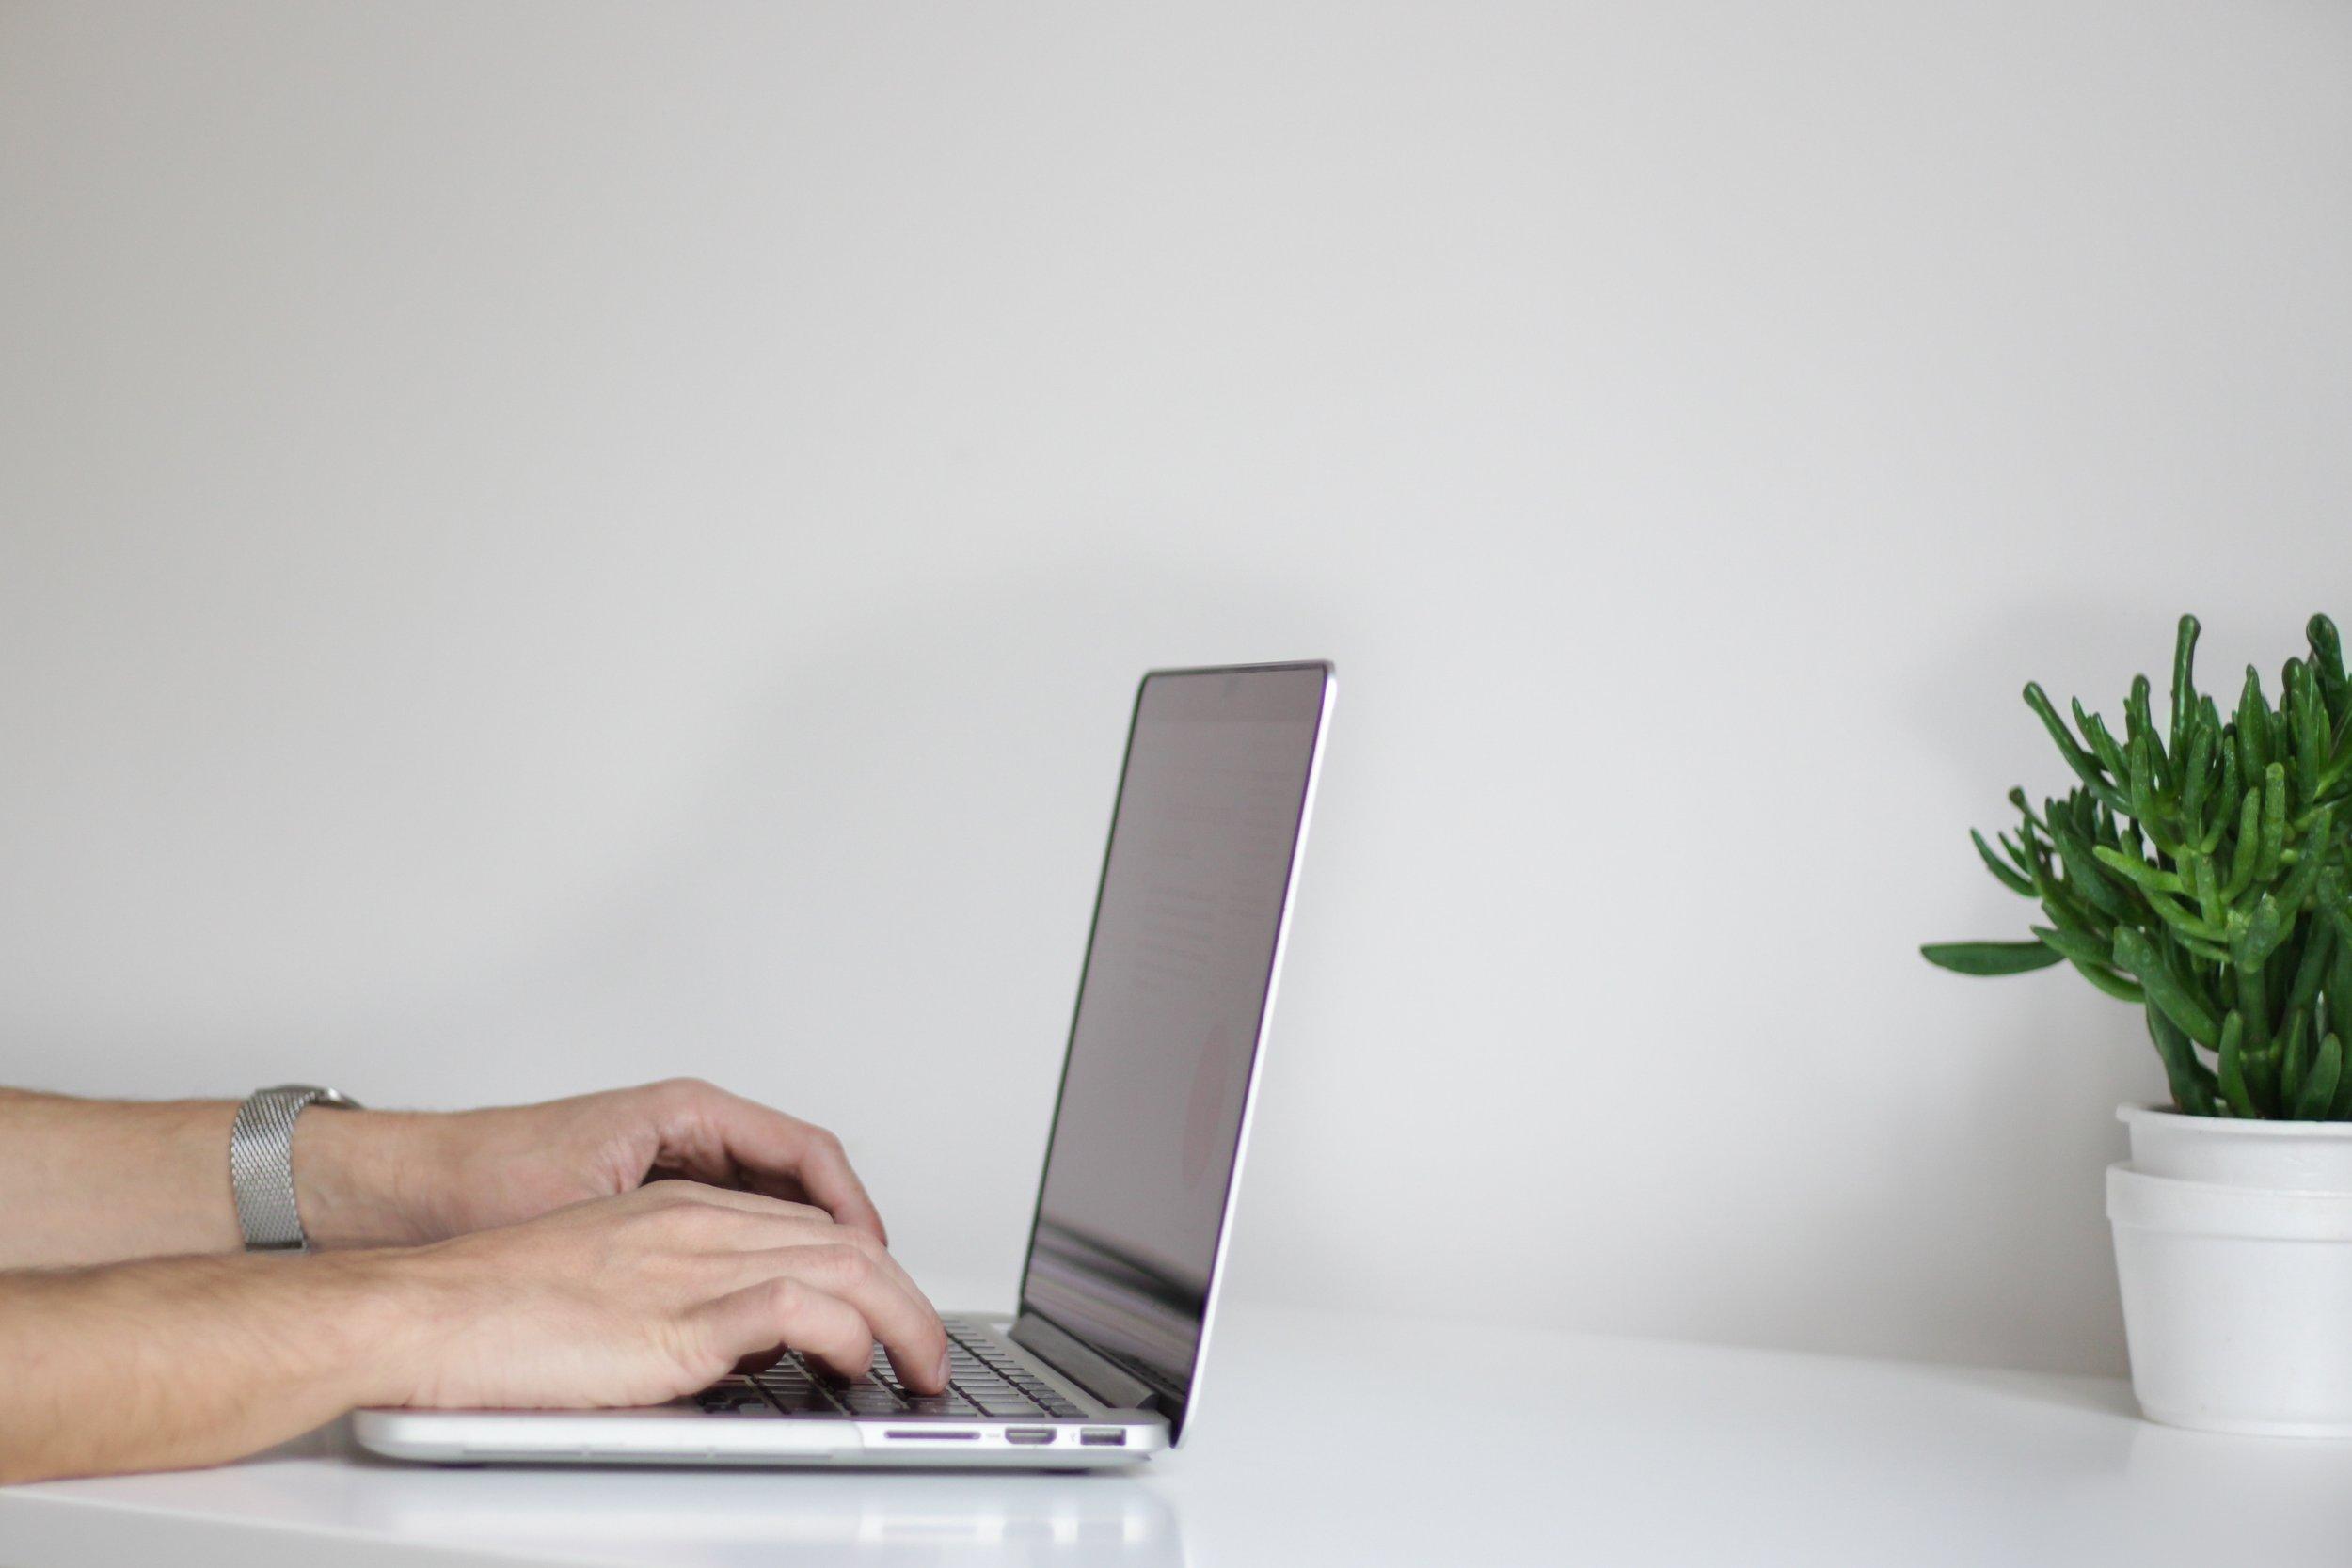 Office_Desk_Laptop